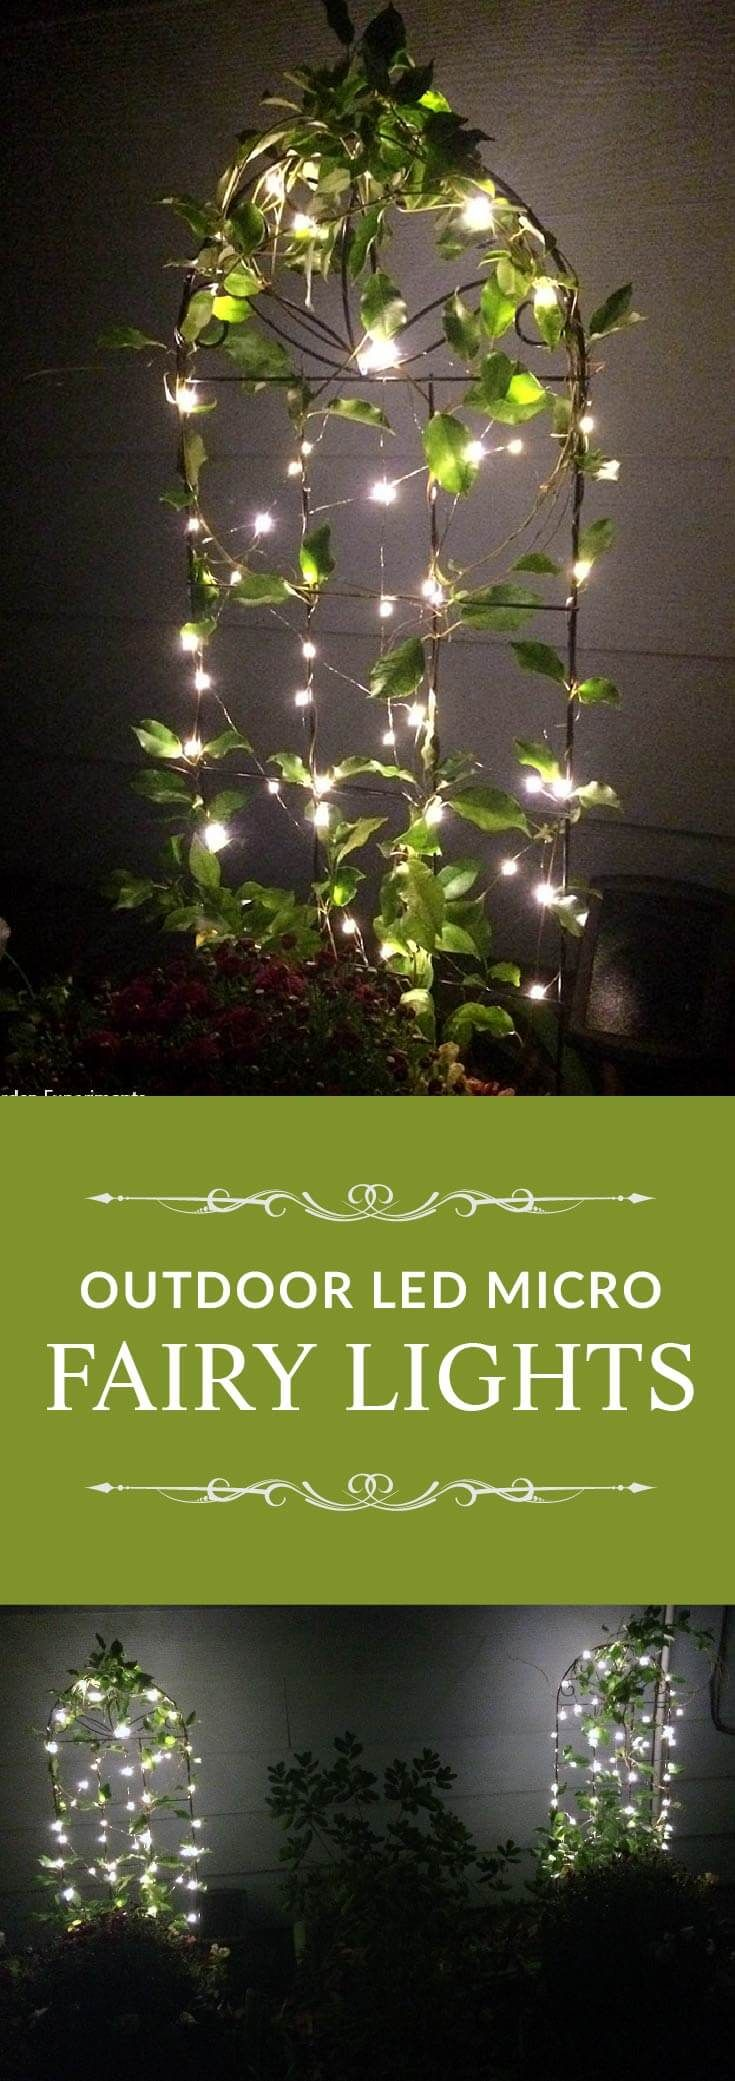 Adding A Little Magic to My Garden Using Fairy Lights